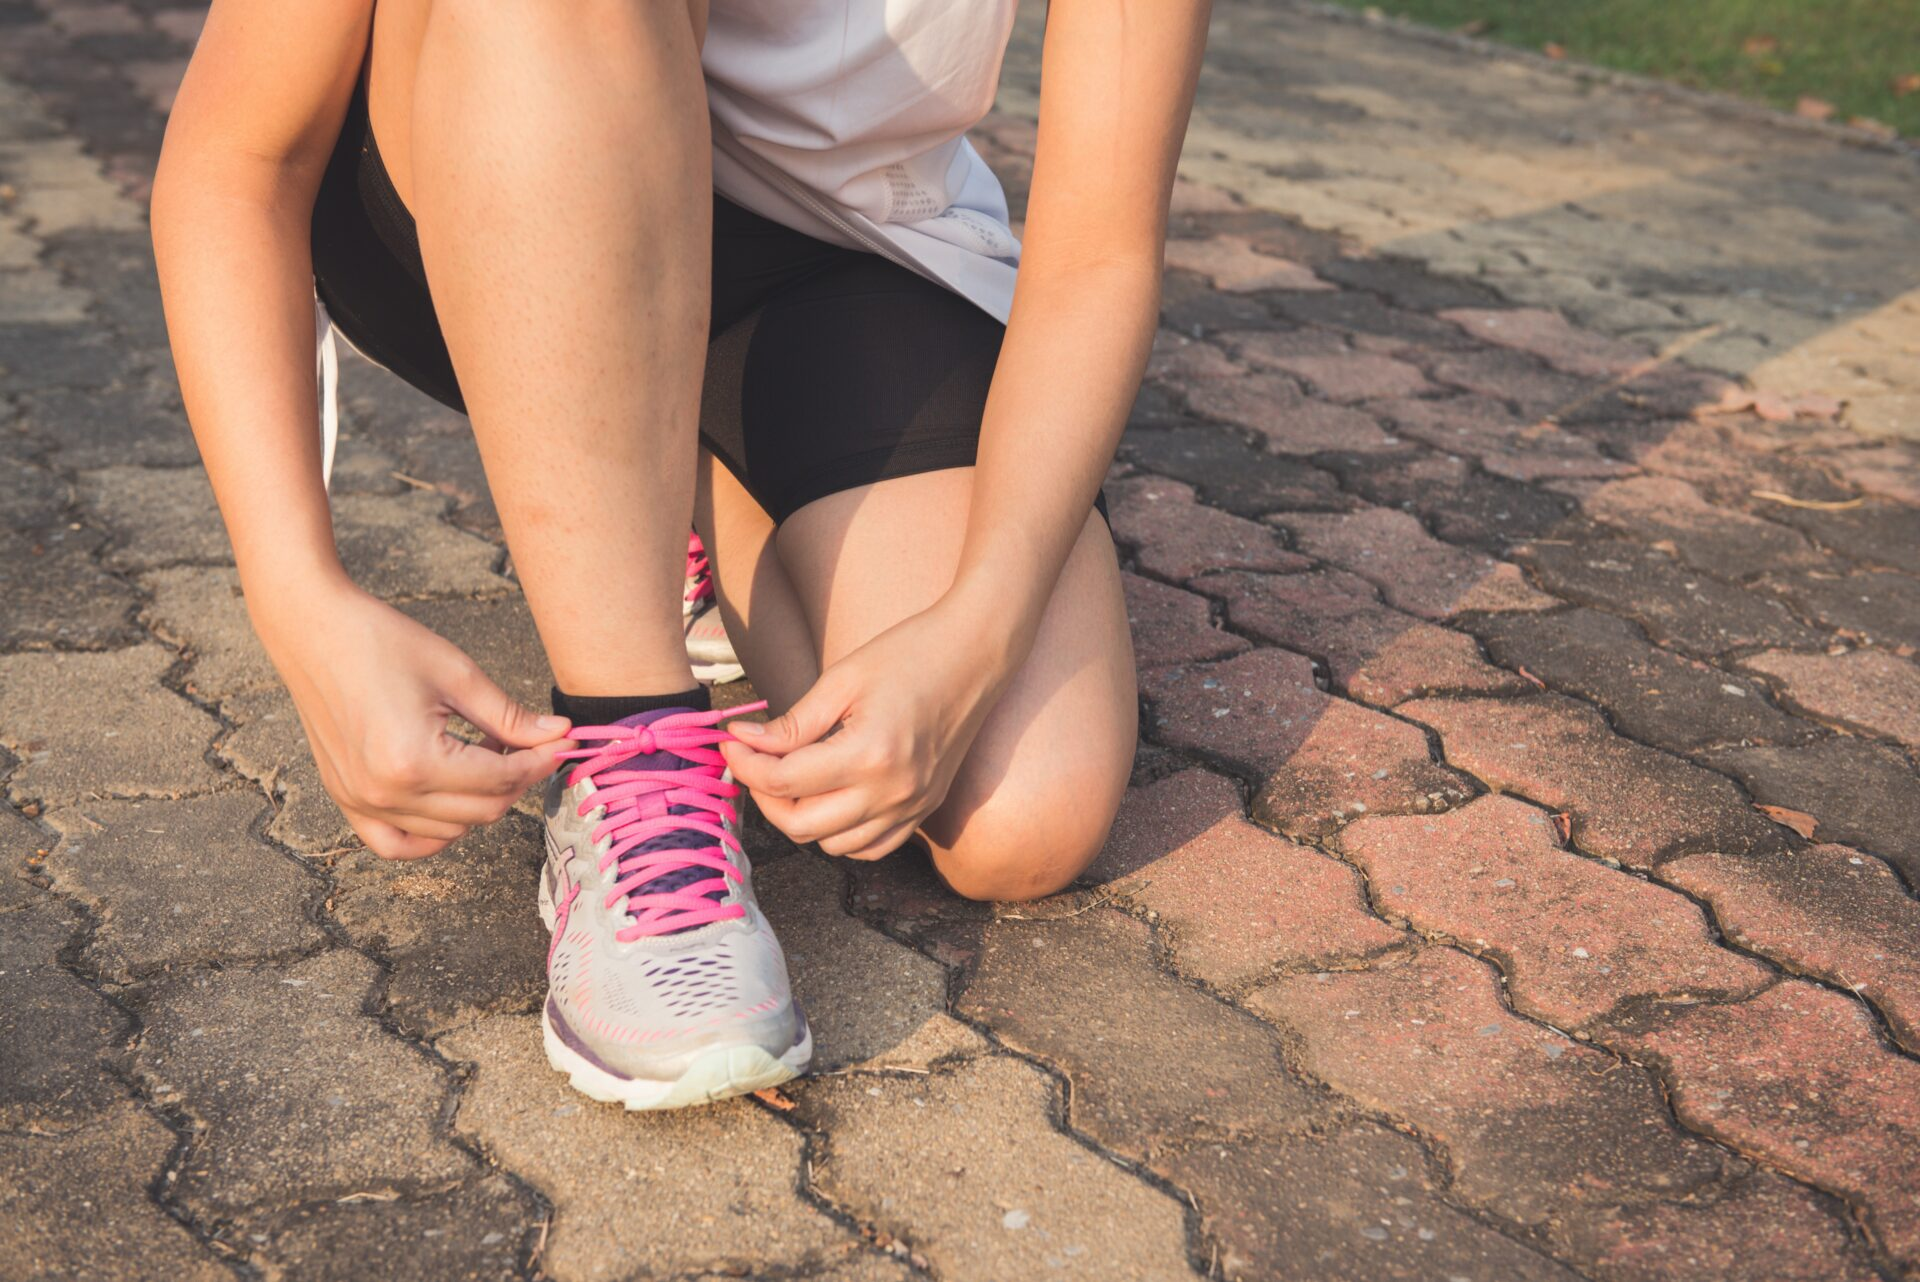 Exercise Female Fitness Foot tying shoe